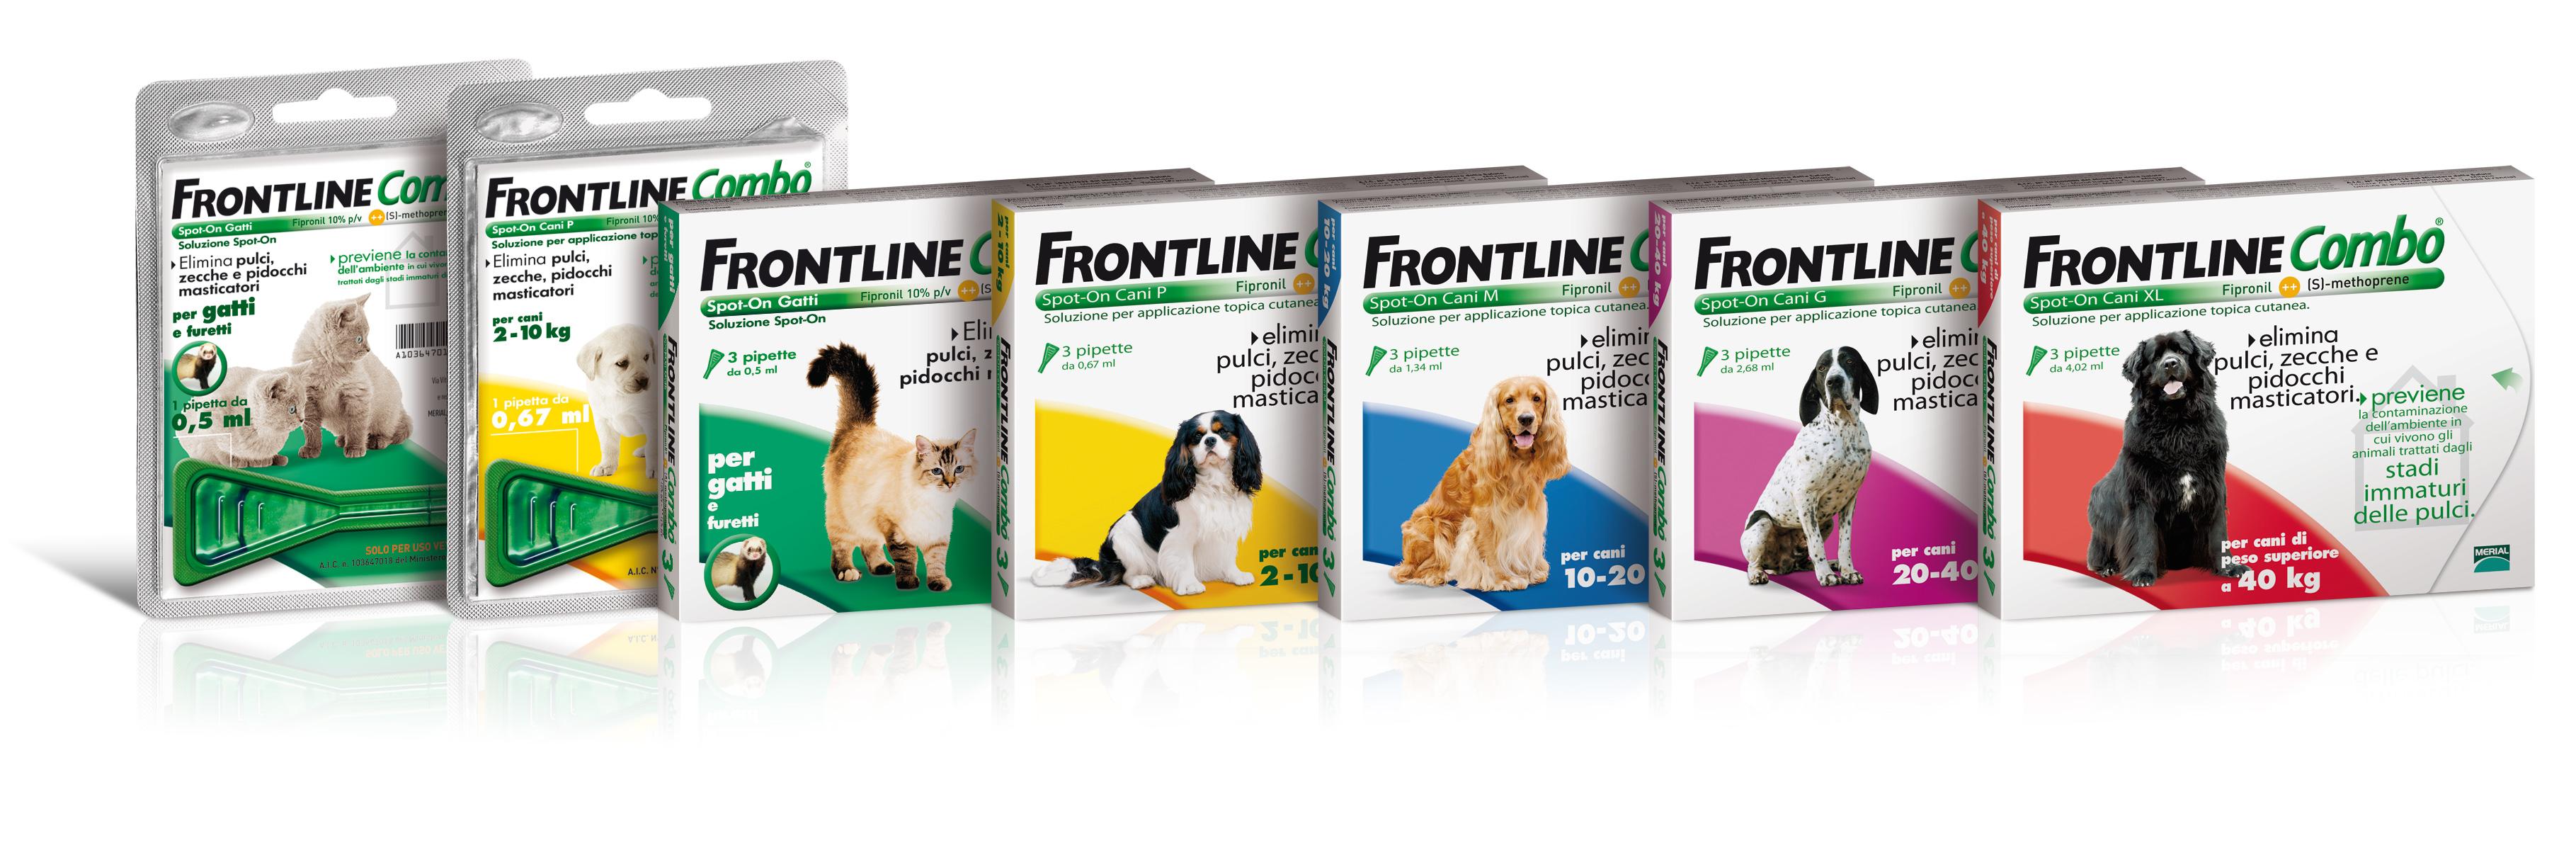 gamma_frontline_combo